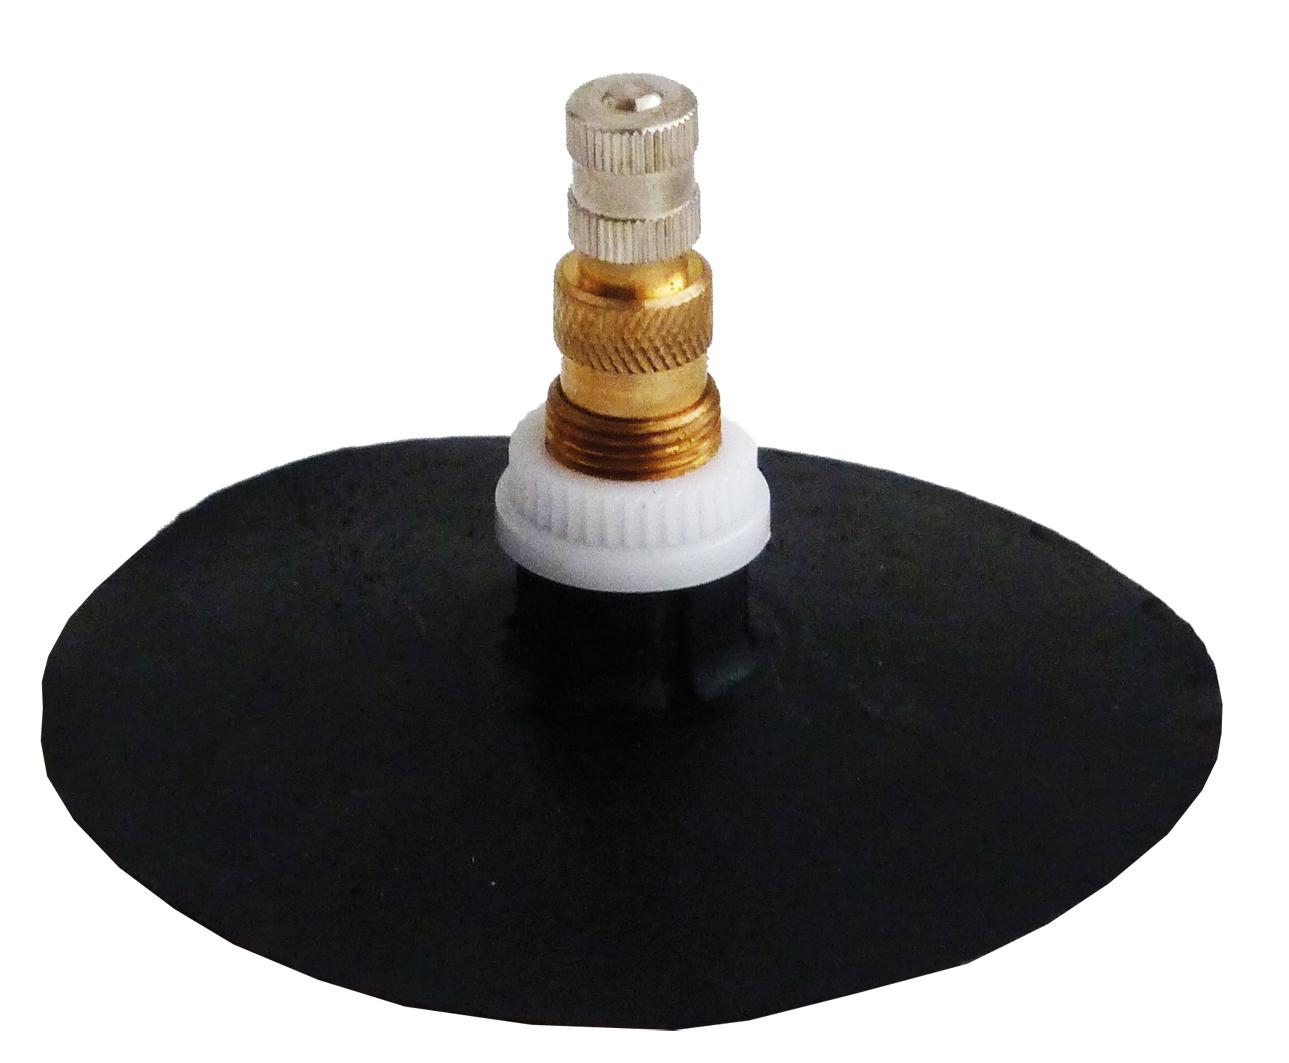 Dušový ventil s patkou GP6/100, průměr 100 mm, AGRO - 1 kus - Ferdus 11.79